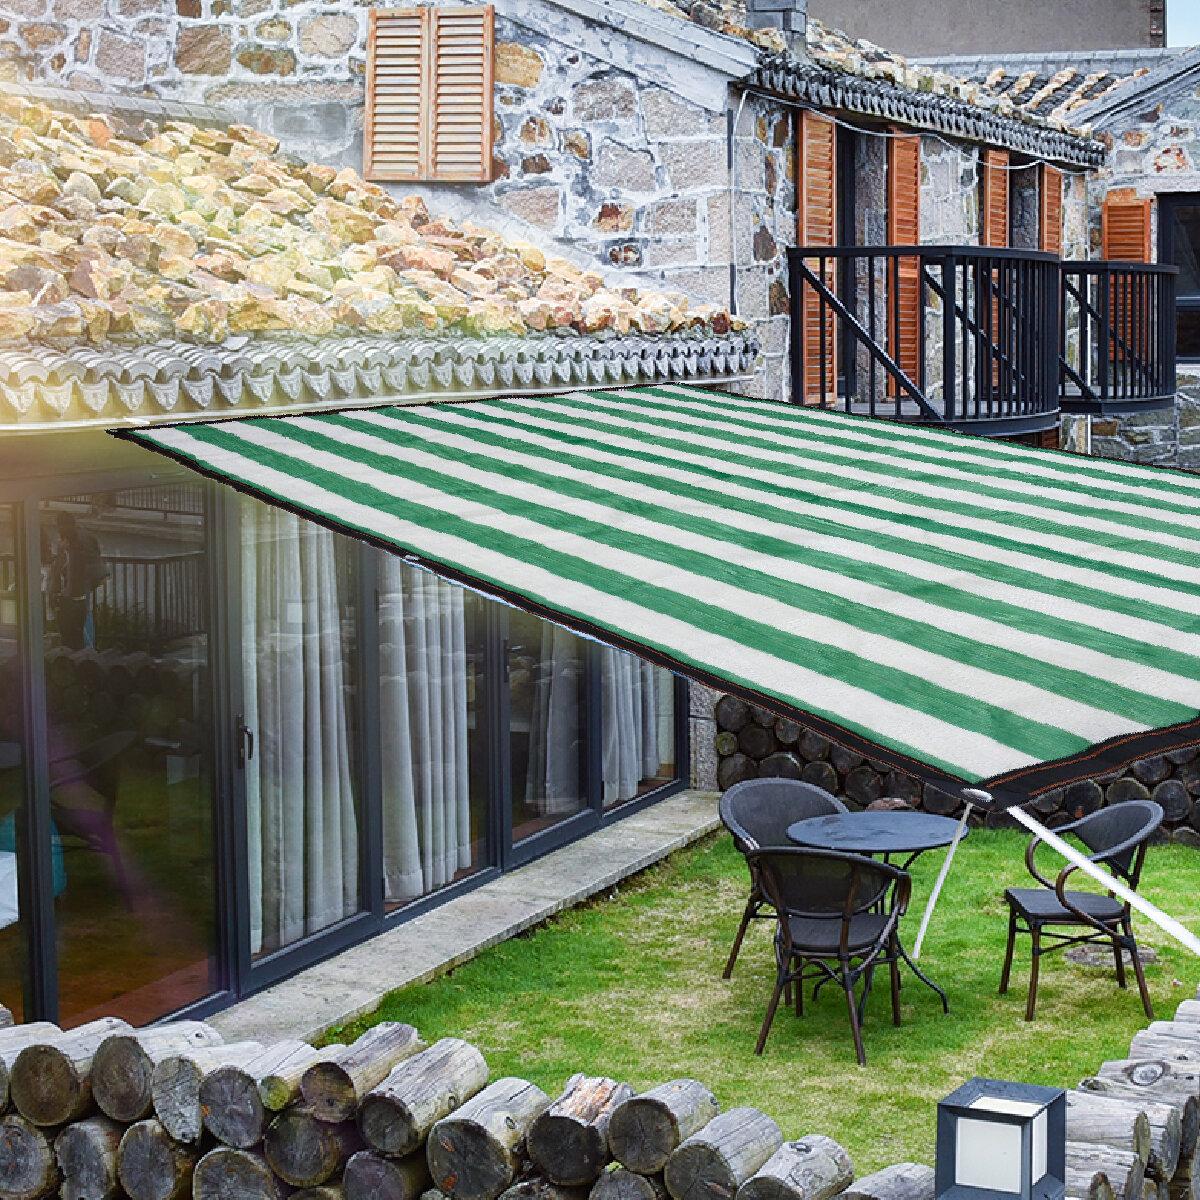 Garden Sunscreen Net Travel Shade UV Resistance Outdoor Plant Greenhouse  ❃